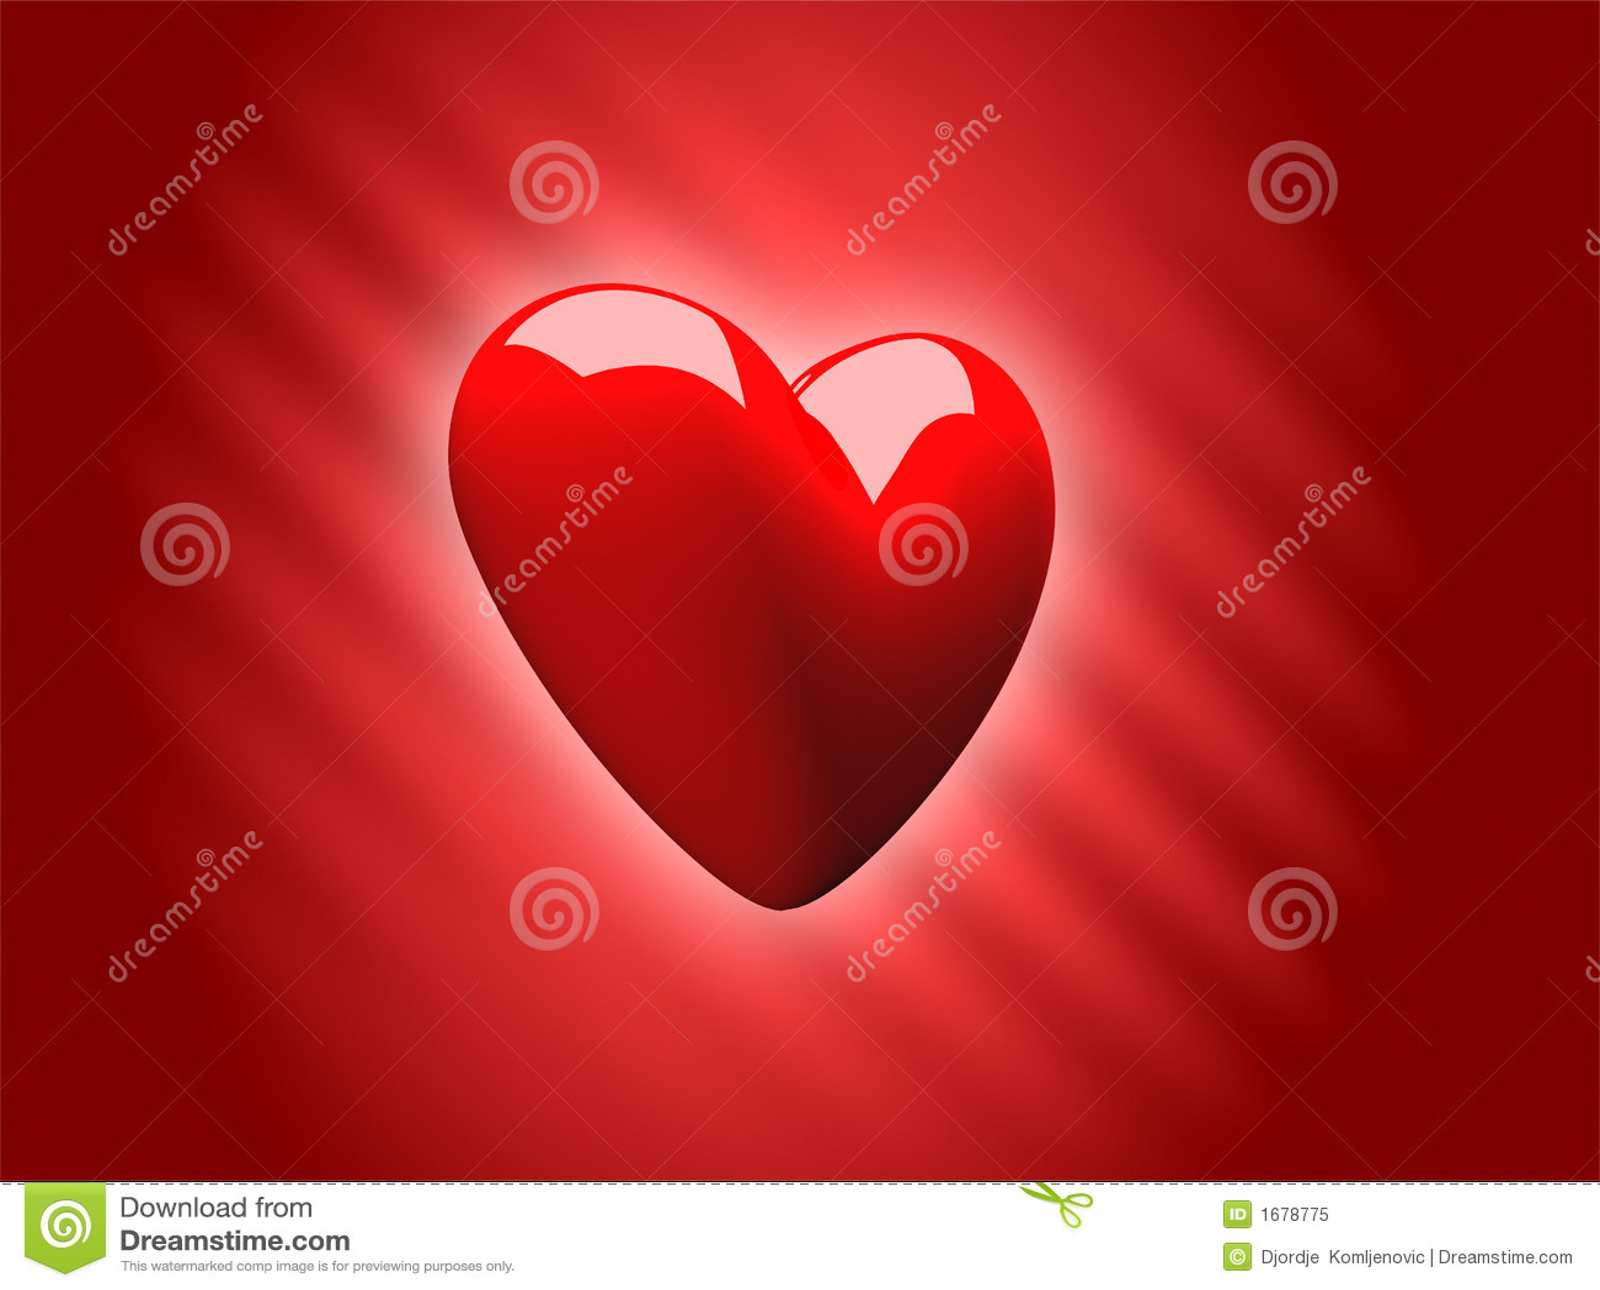 Valentine's Love Heart 3D Royalty Free Stock Photo